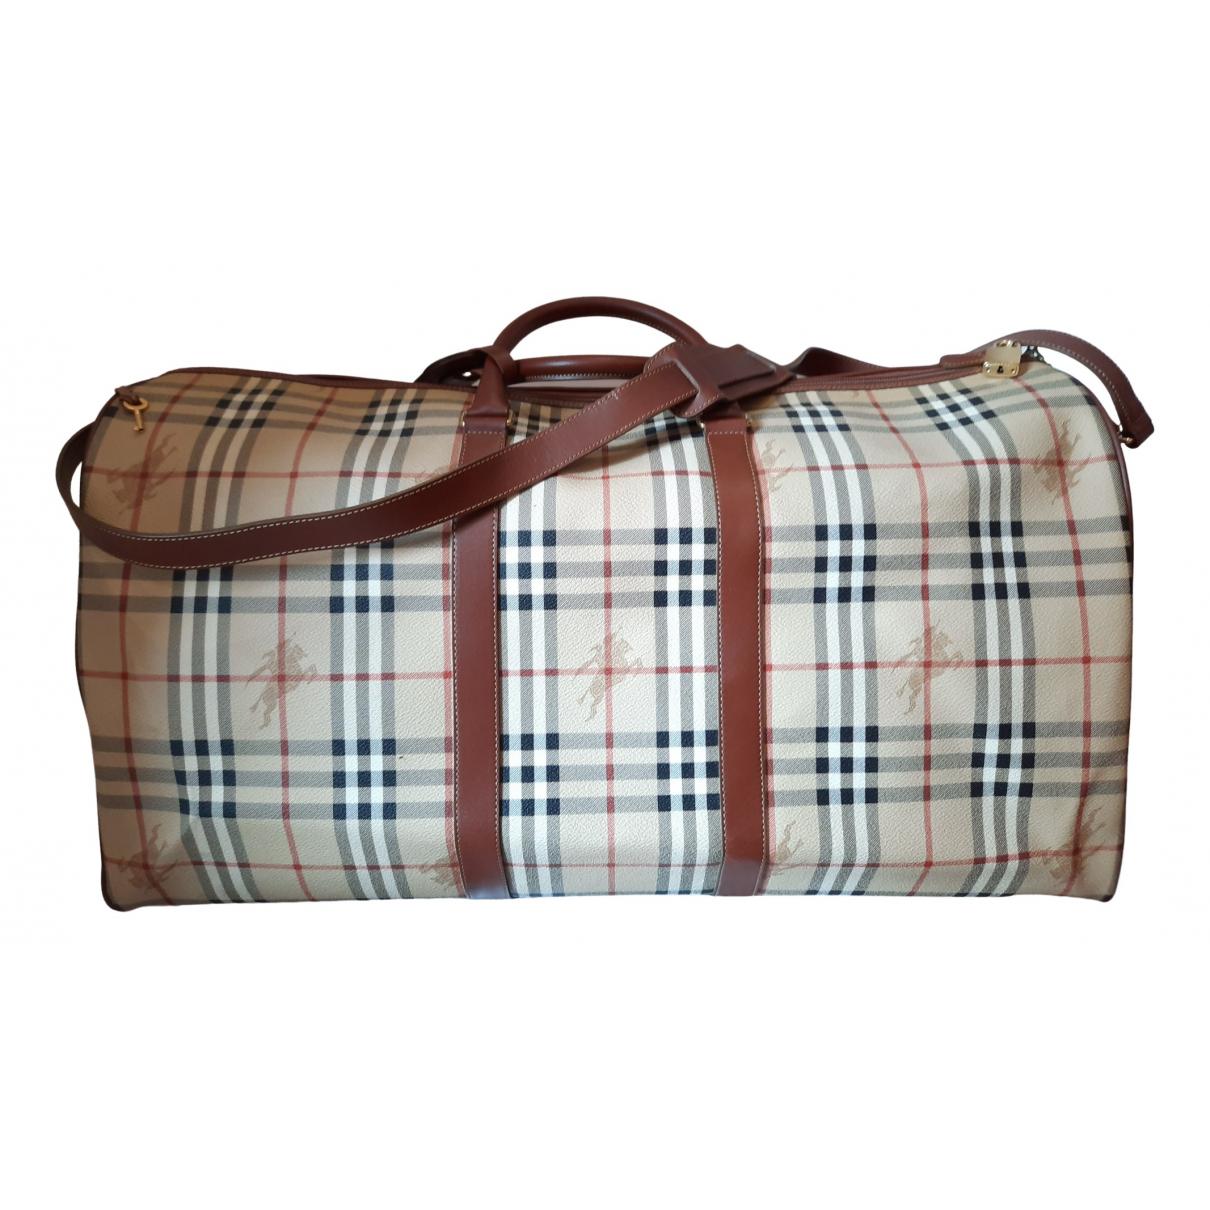 Burberry \N Beige Cloth bag for Men \N